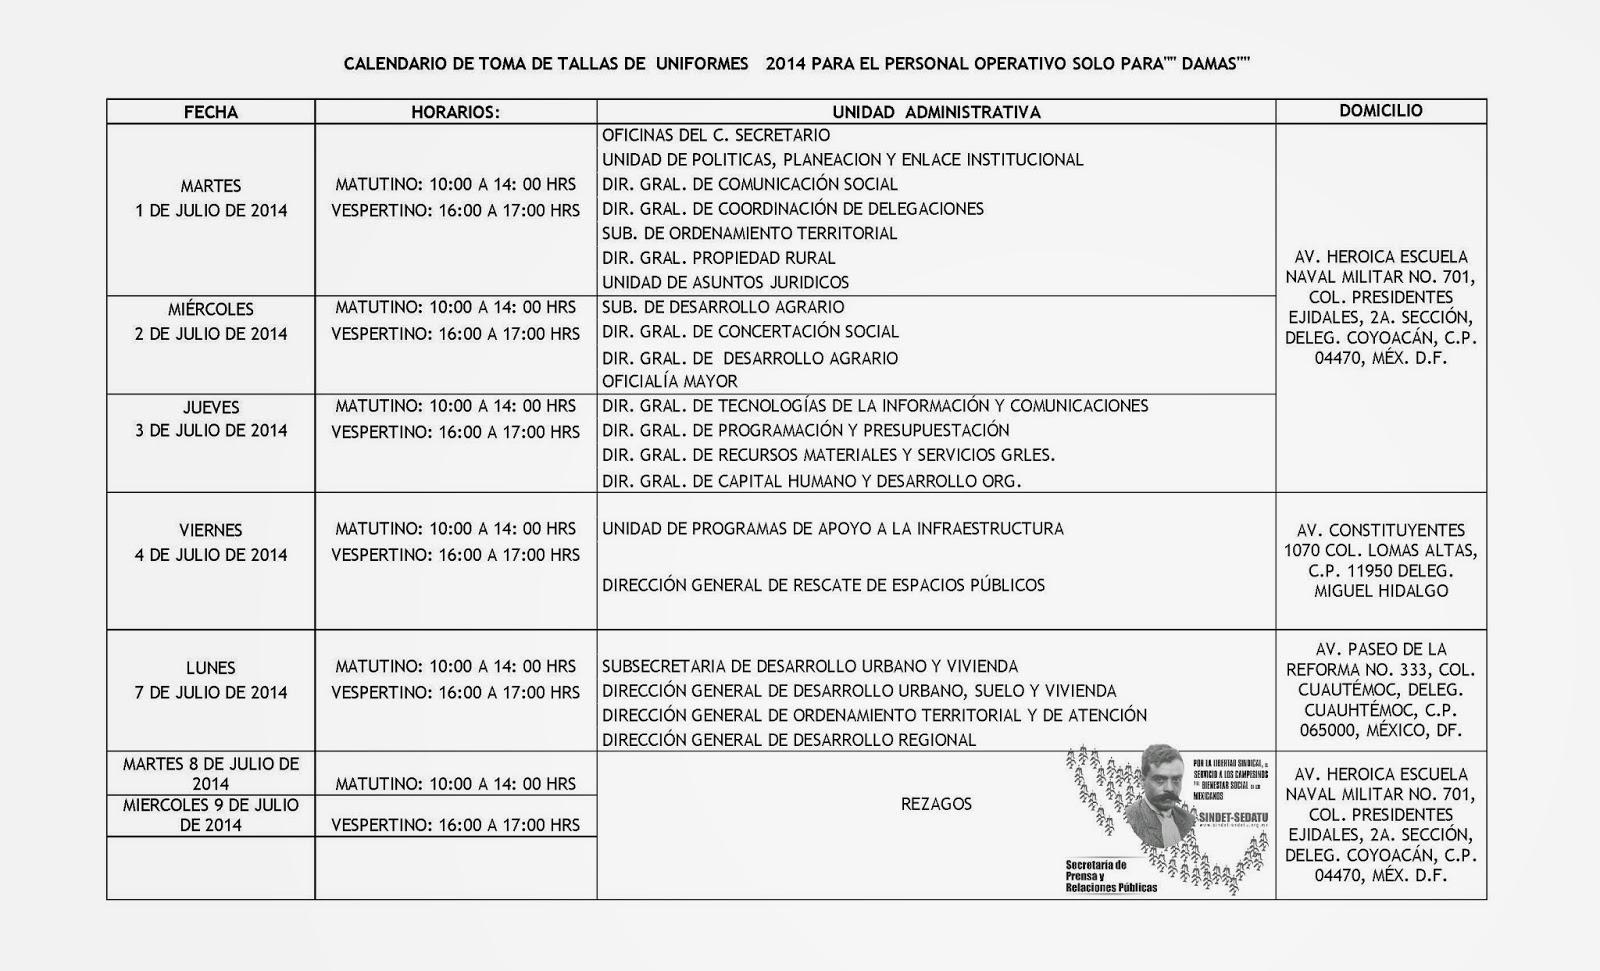 http://sindet-sedatu.org.mx/web/doctos/CALENDARIO_DE_TOMA_DE_TALLAS_DAMA.pdf